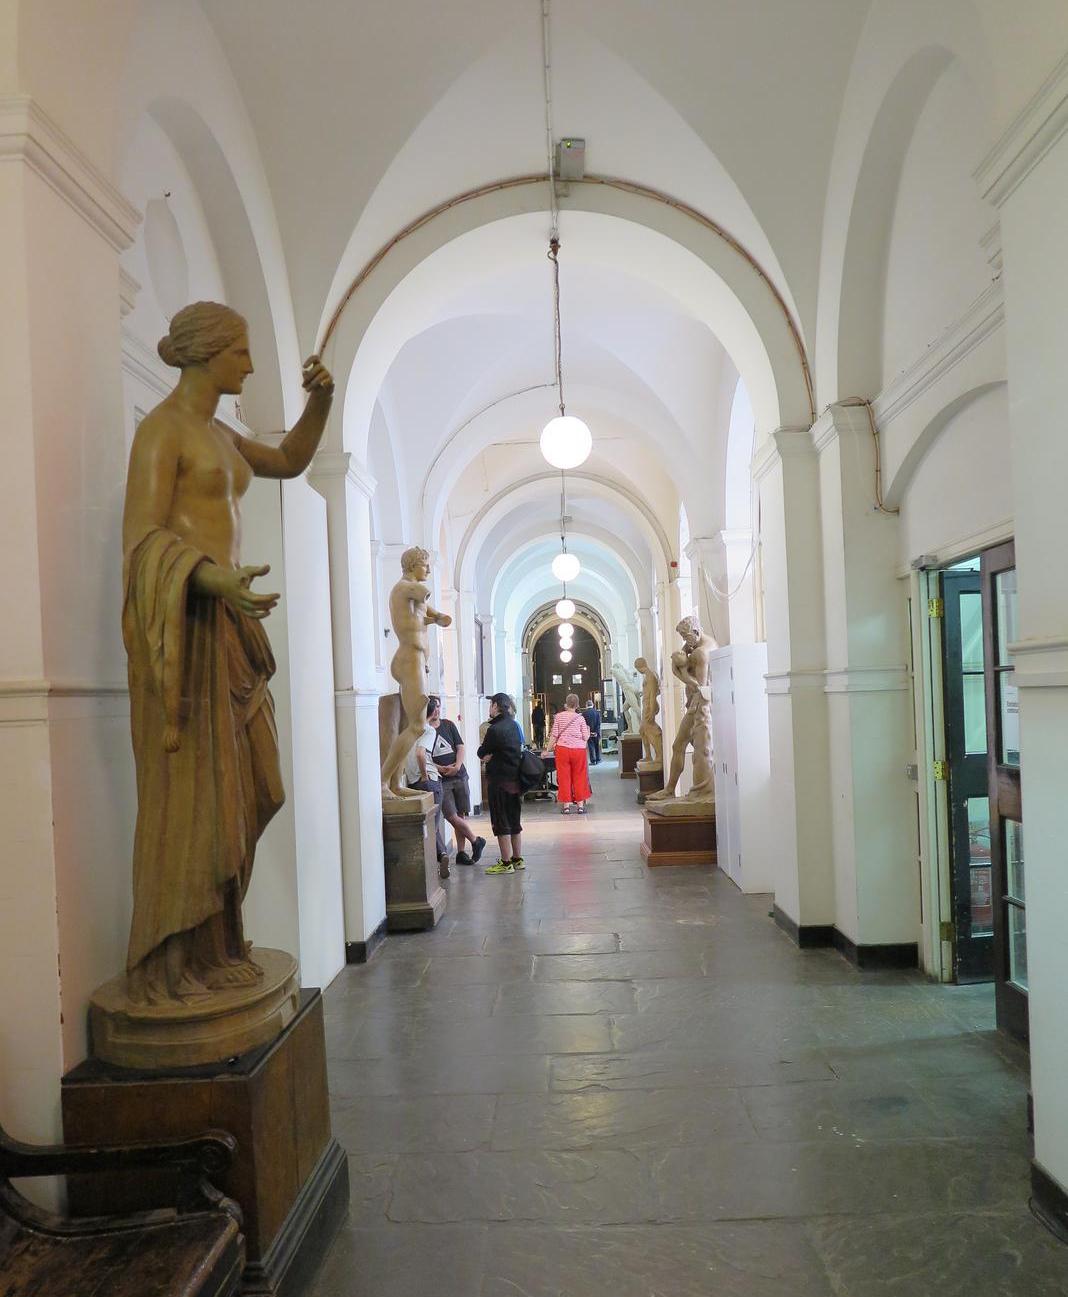 Gang in de Royal Academy Of Arts